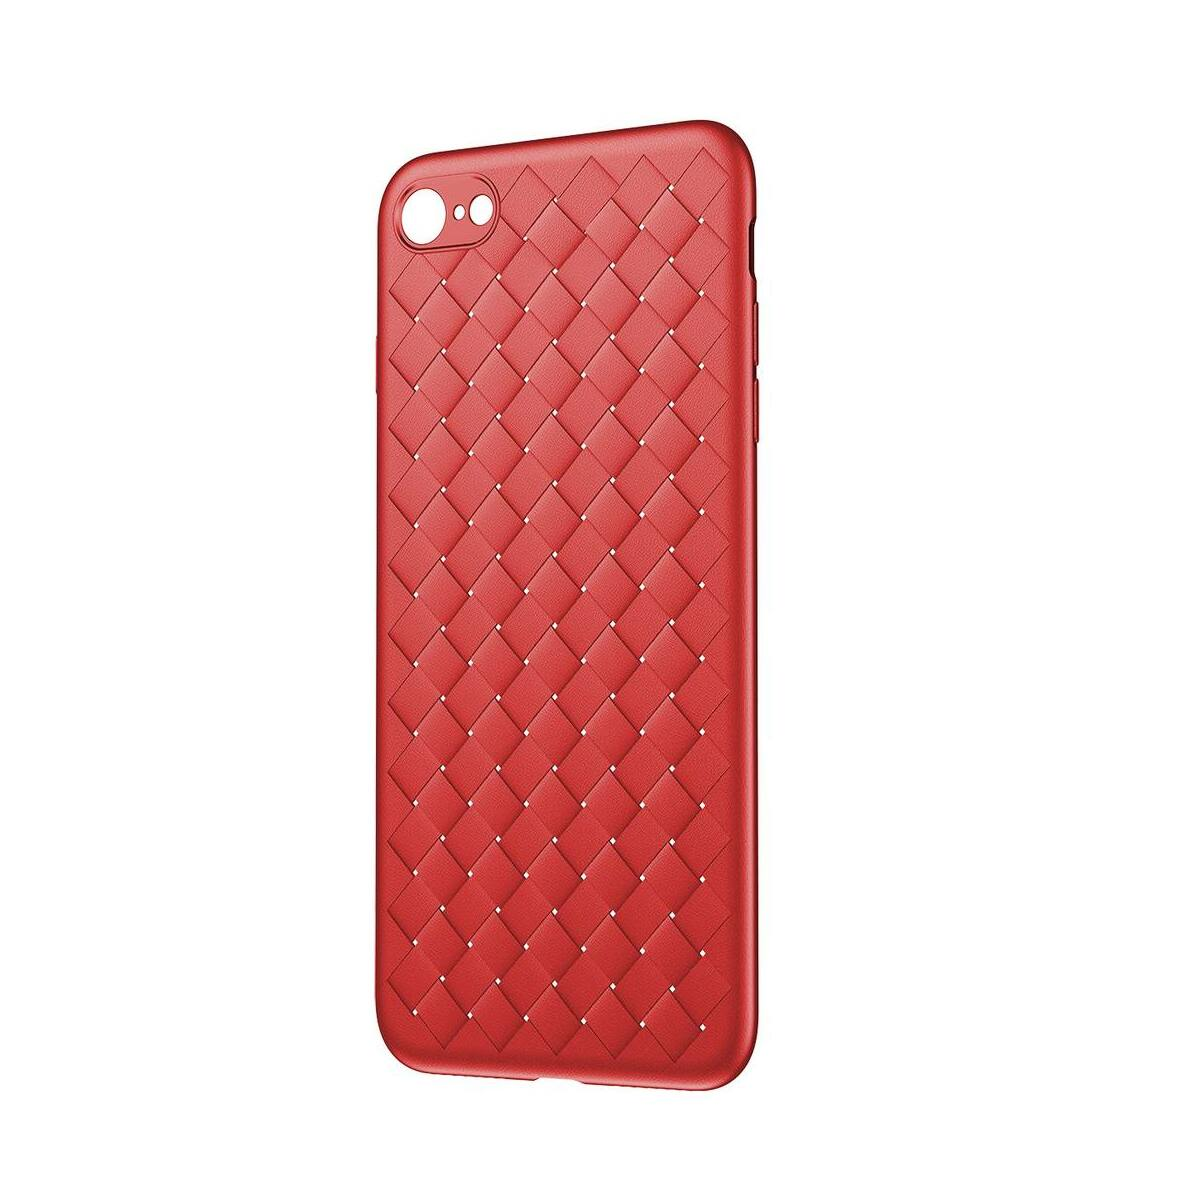 Baseus iPhone 8/7 tok, BV Weaving, piros (WIAPIPH8N-BV09)